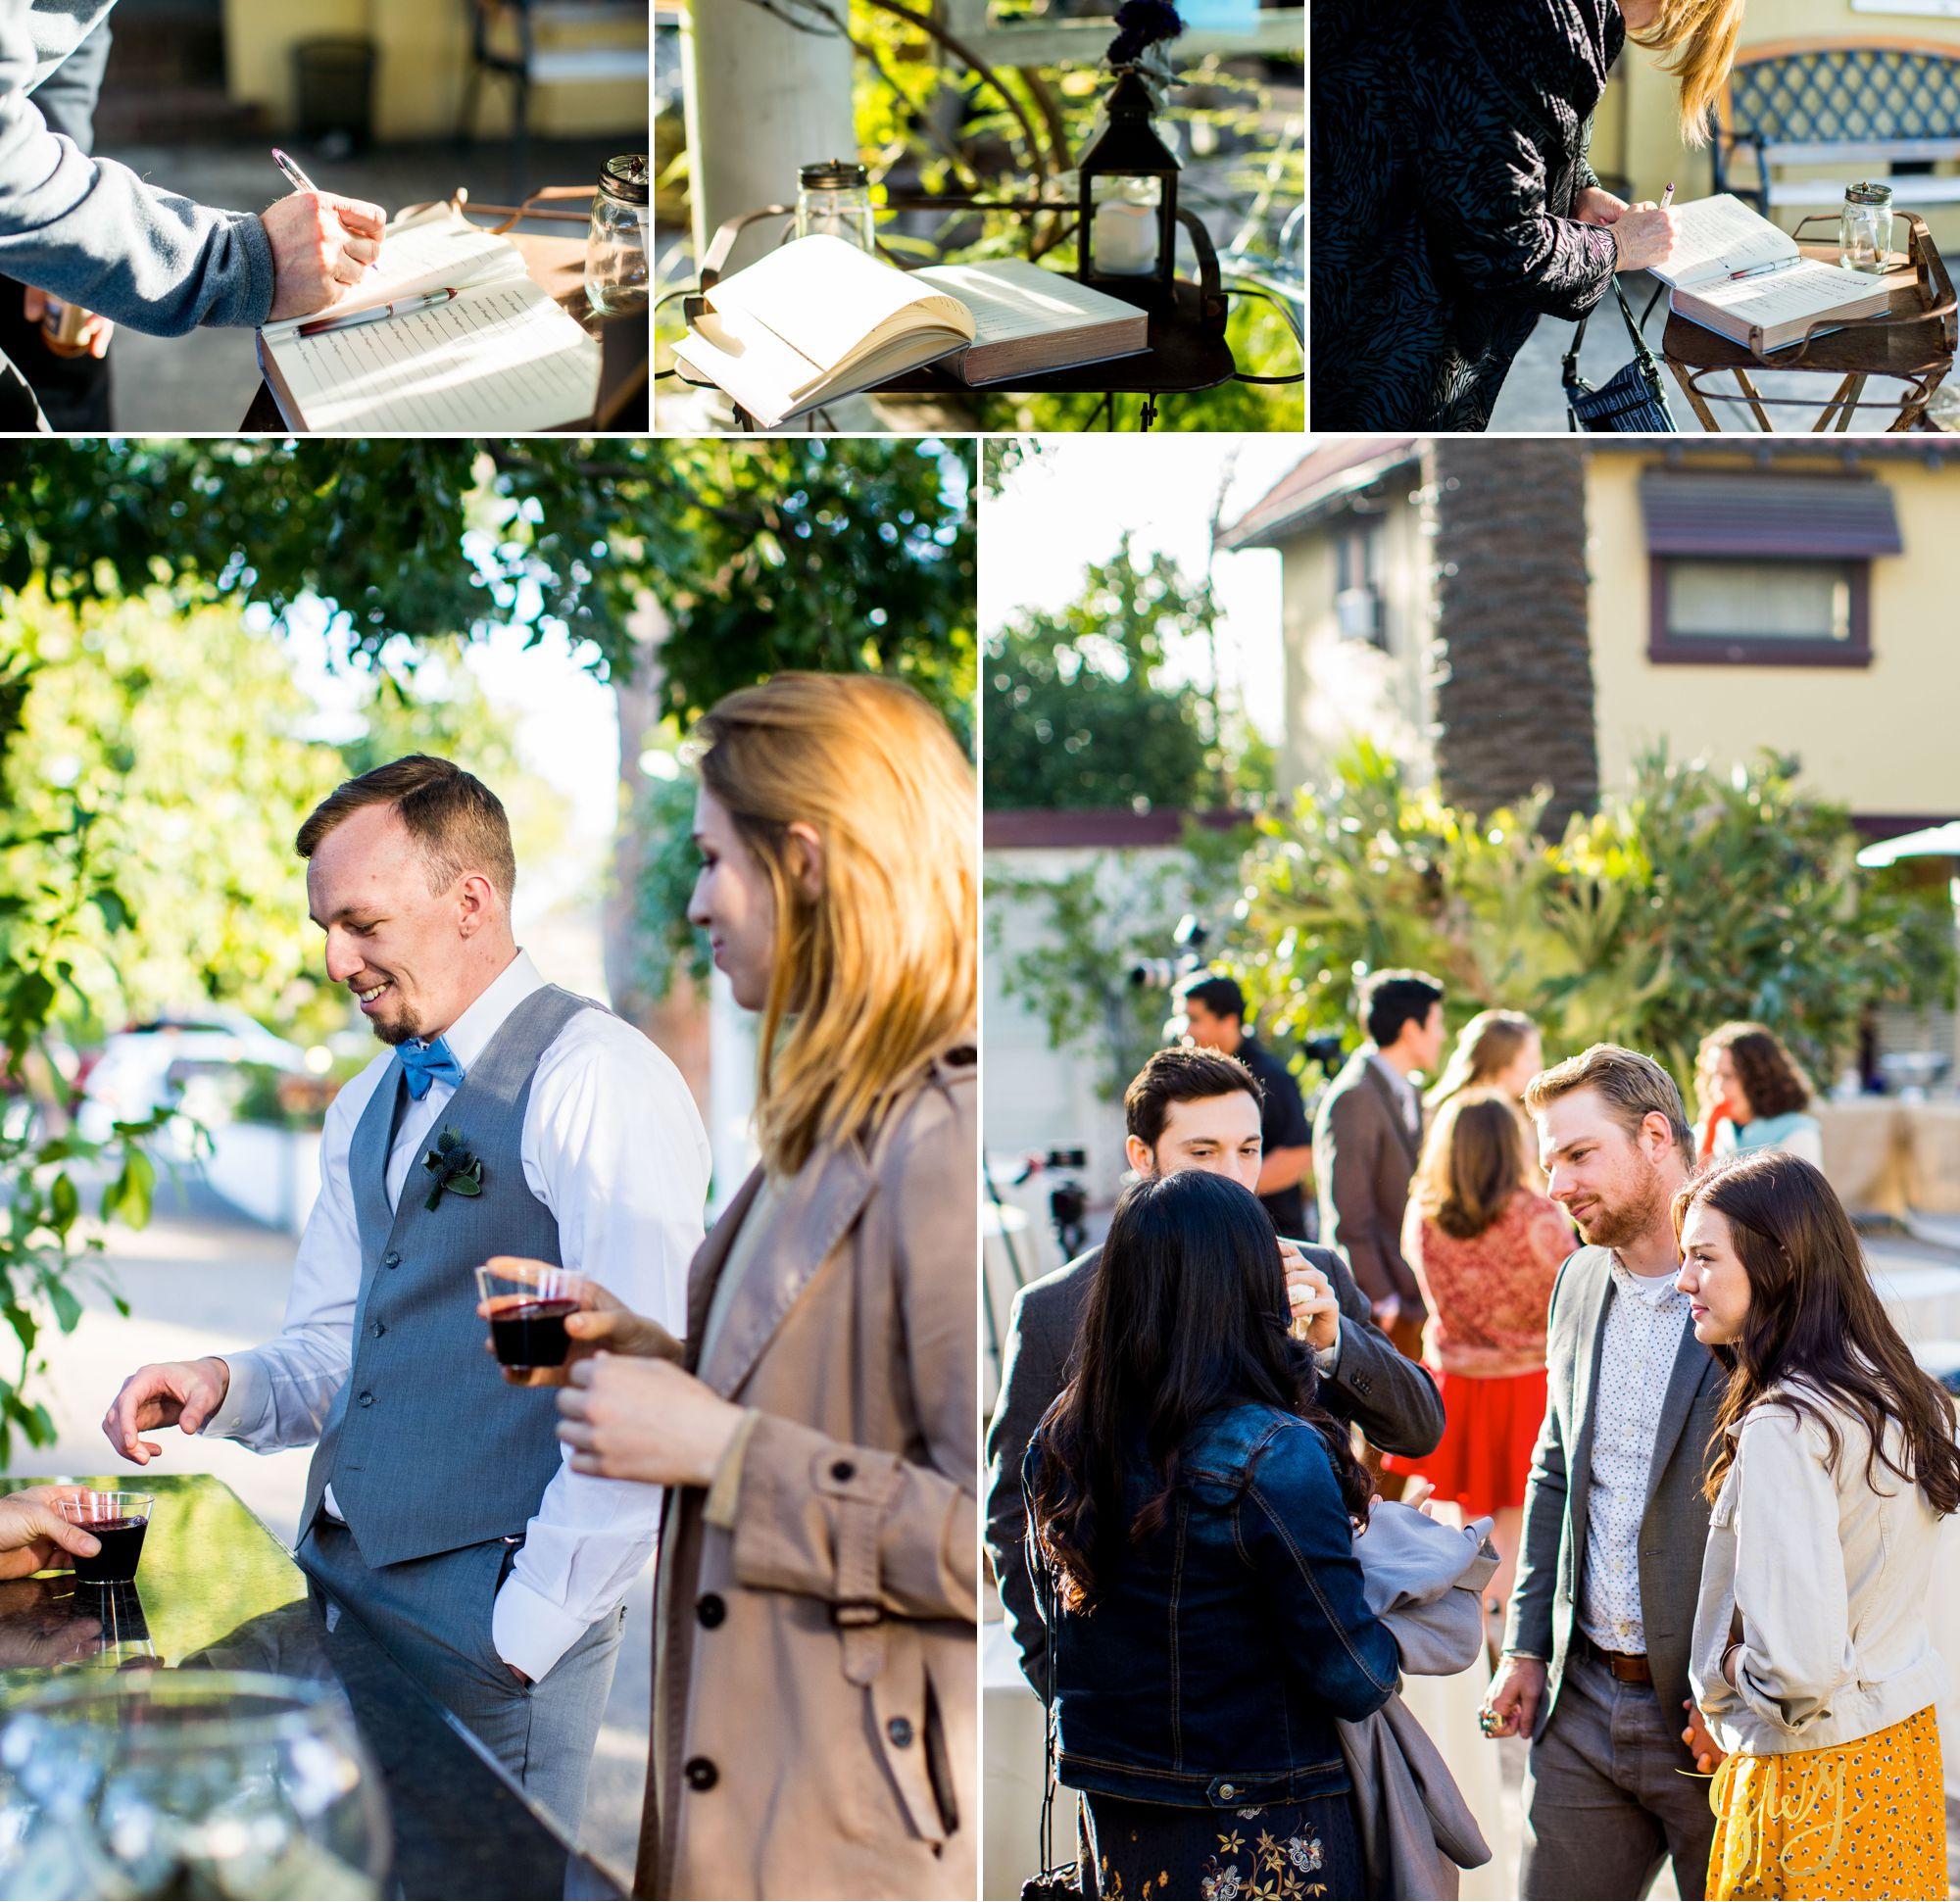 Garrett + Michelle's French Estate Orange County Spring Wedding by Glass Woods Media 30.jpg